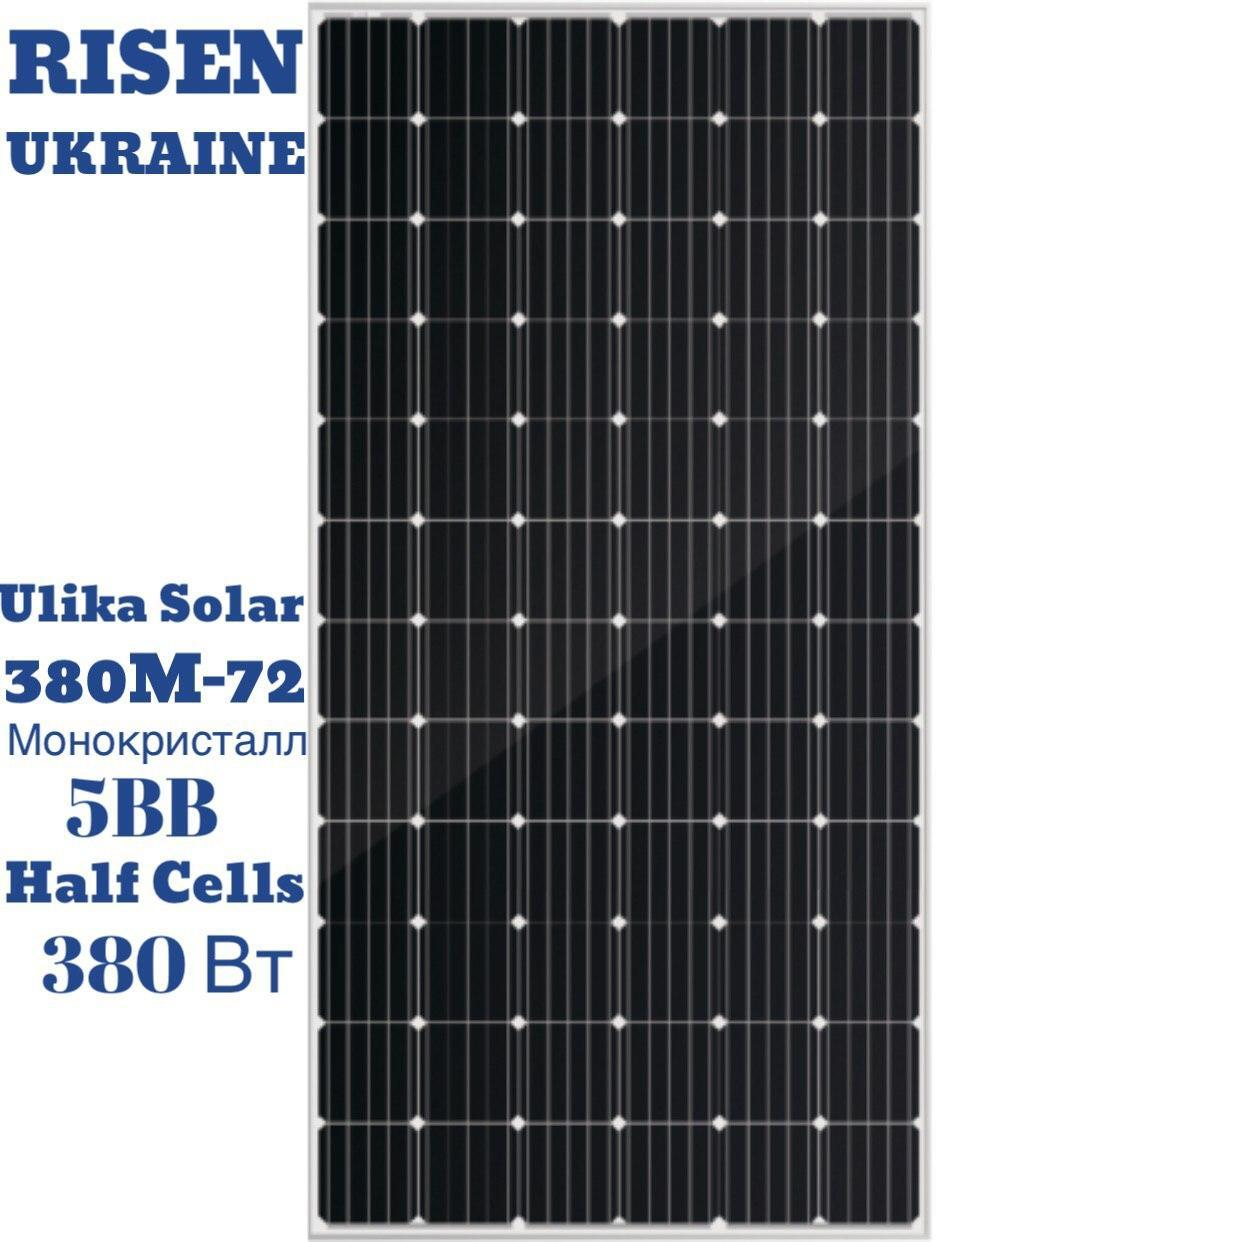 Солнечная батарея Ulica Solar UL-380M-72, монокристалл, 380 Вт, 5 ВВ, 72 CELL